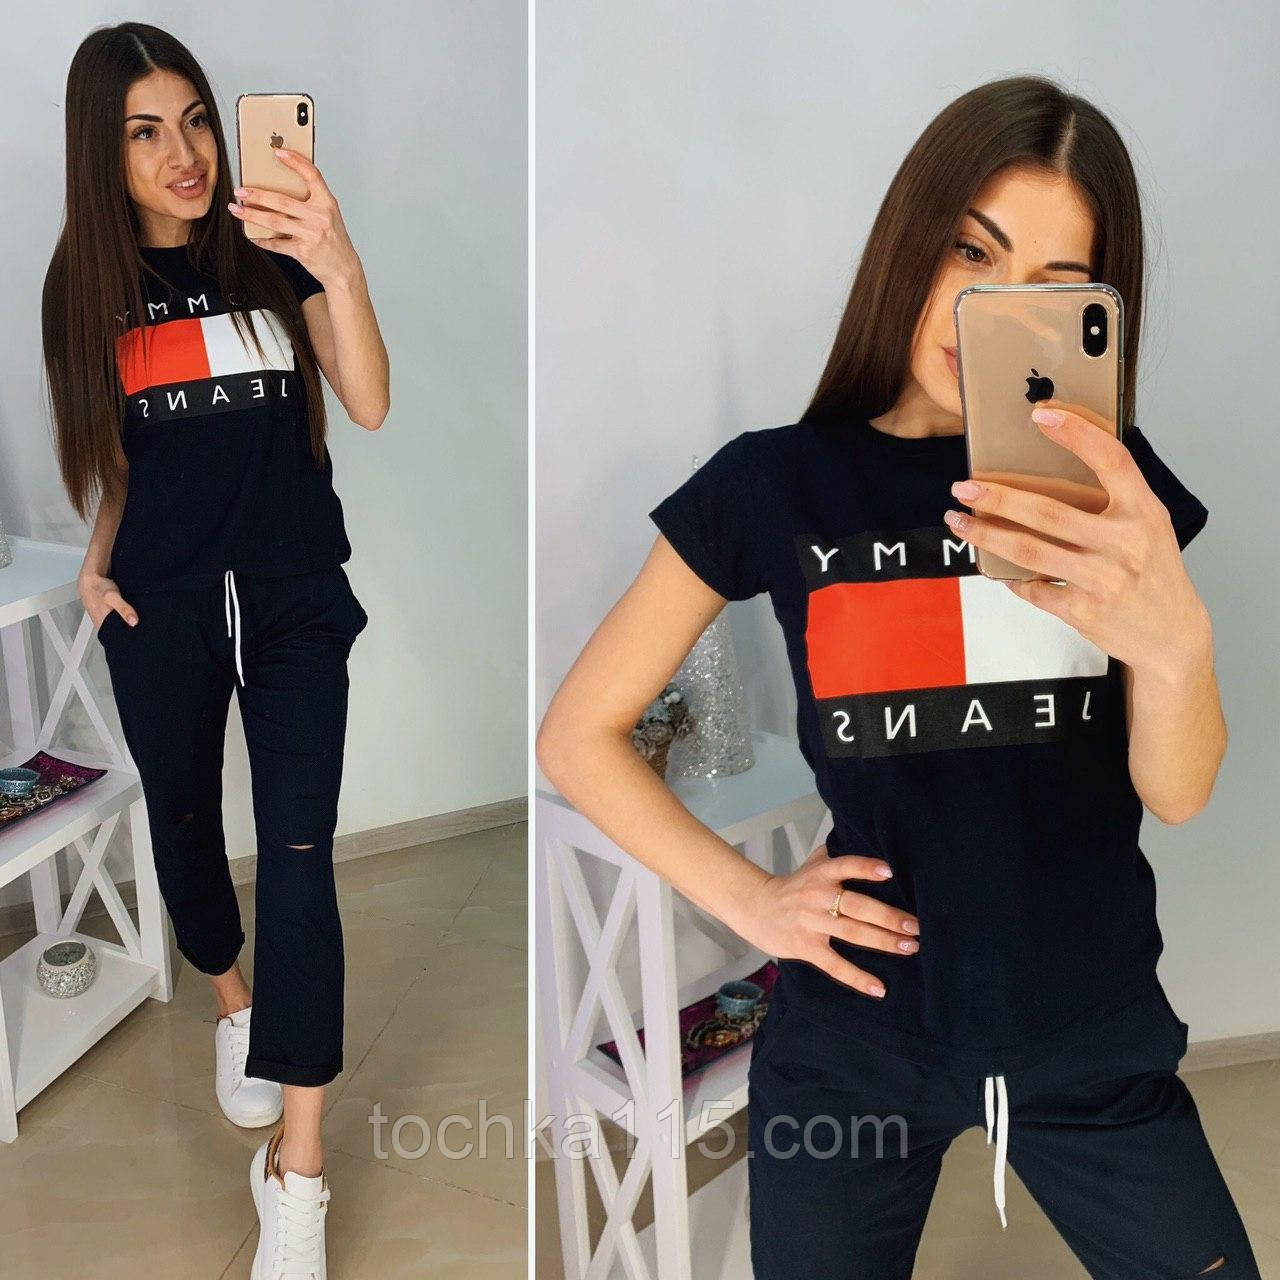 Стильная елая женская футболка TH на лето S/M/L/XL